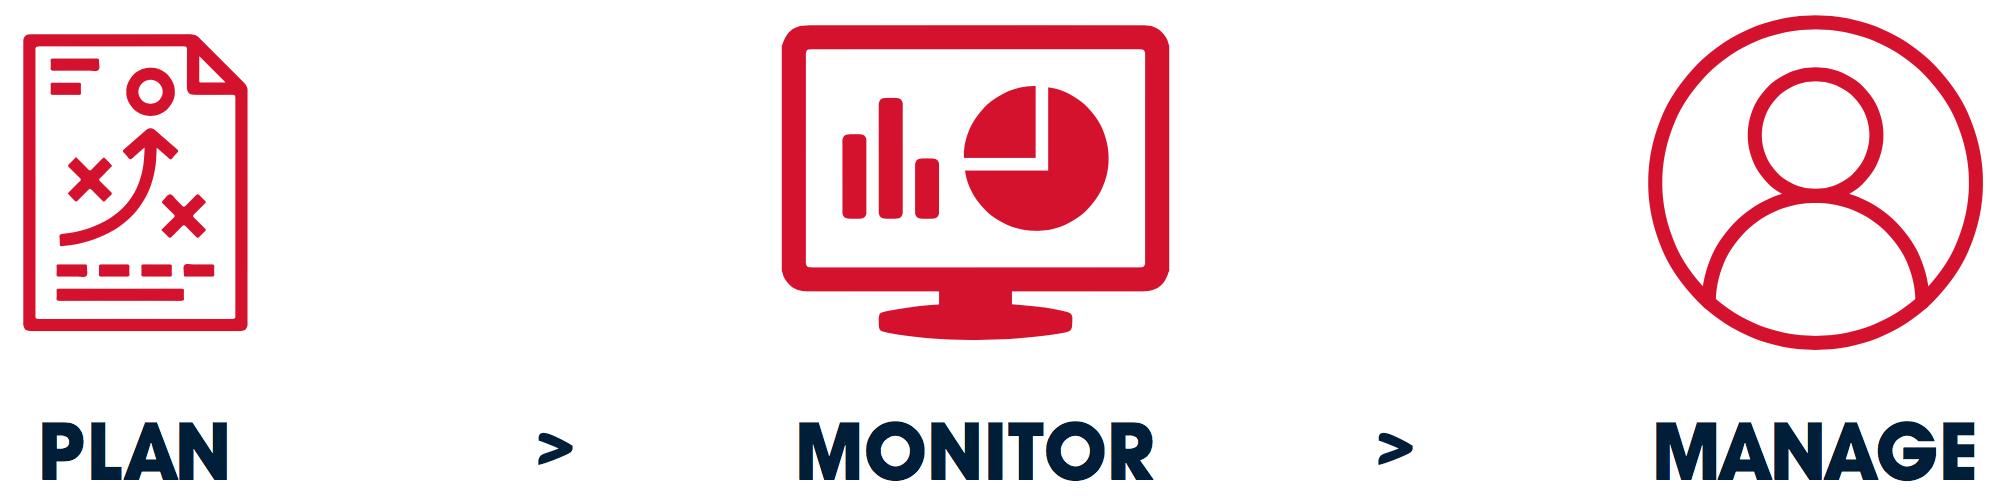 Social Media Reputation - Plan, Monitor, Manage